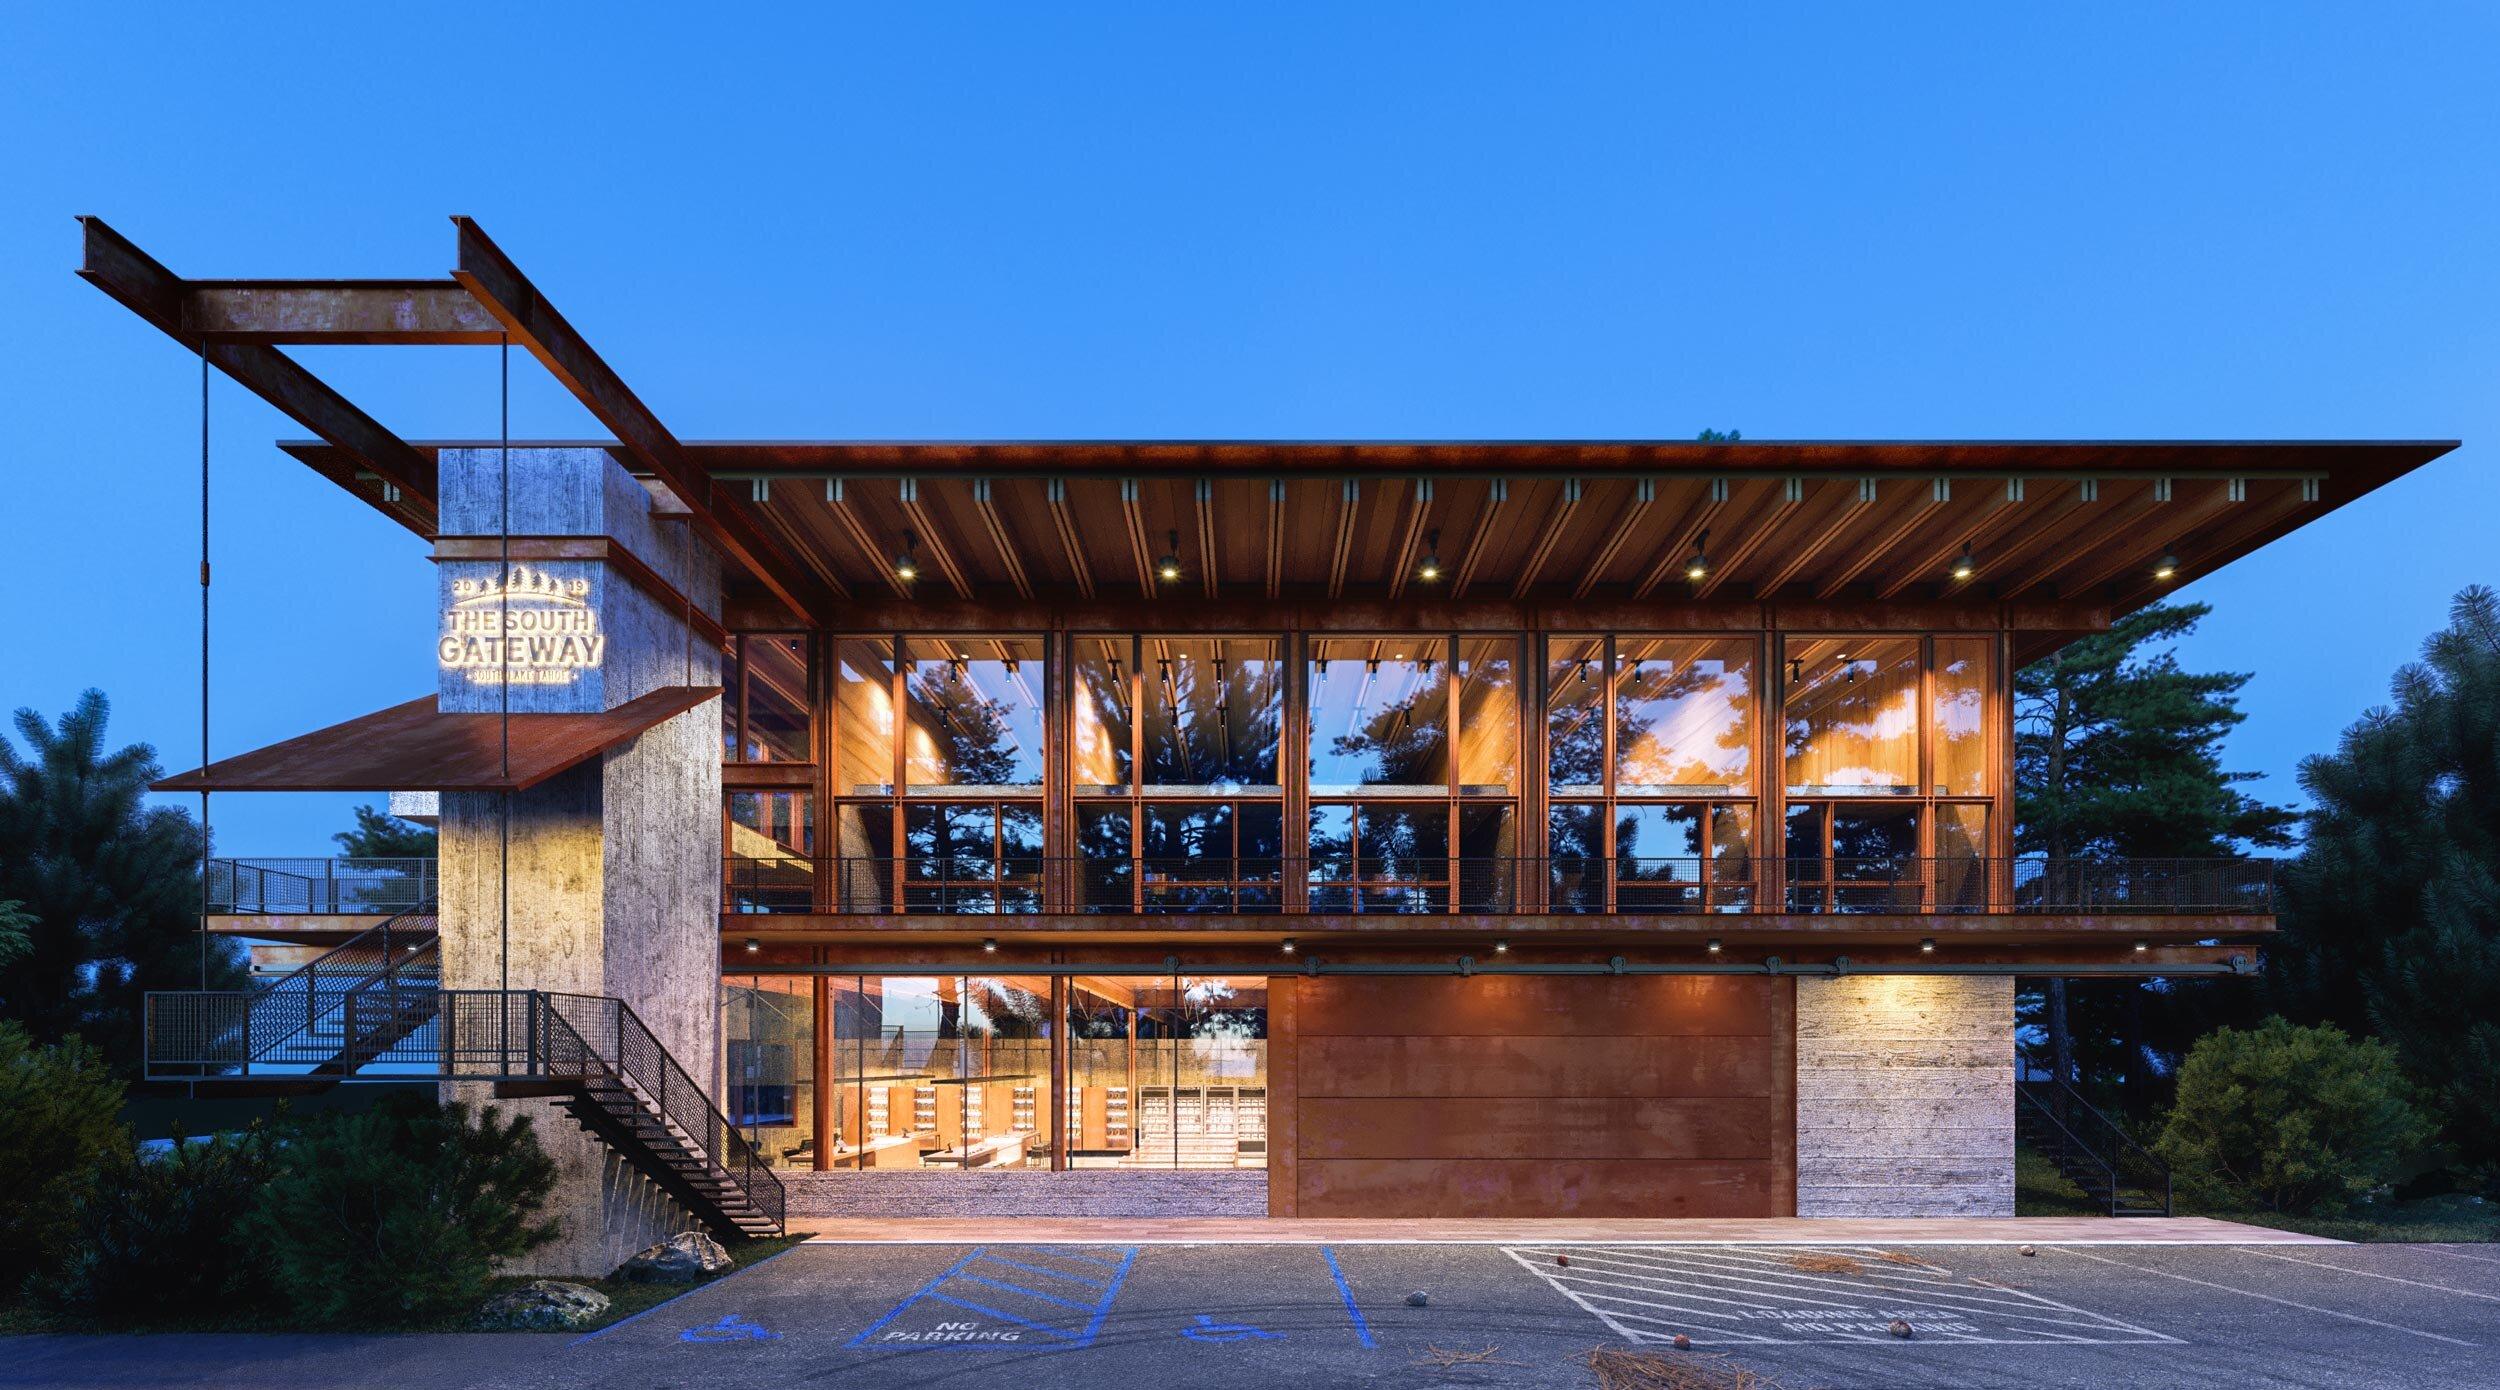 cannabis-retail-store-south-lake-tahoe-archillusion-design-09.jpg